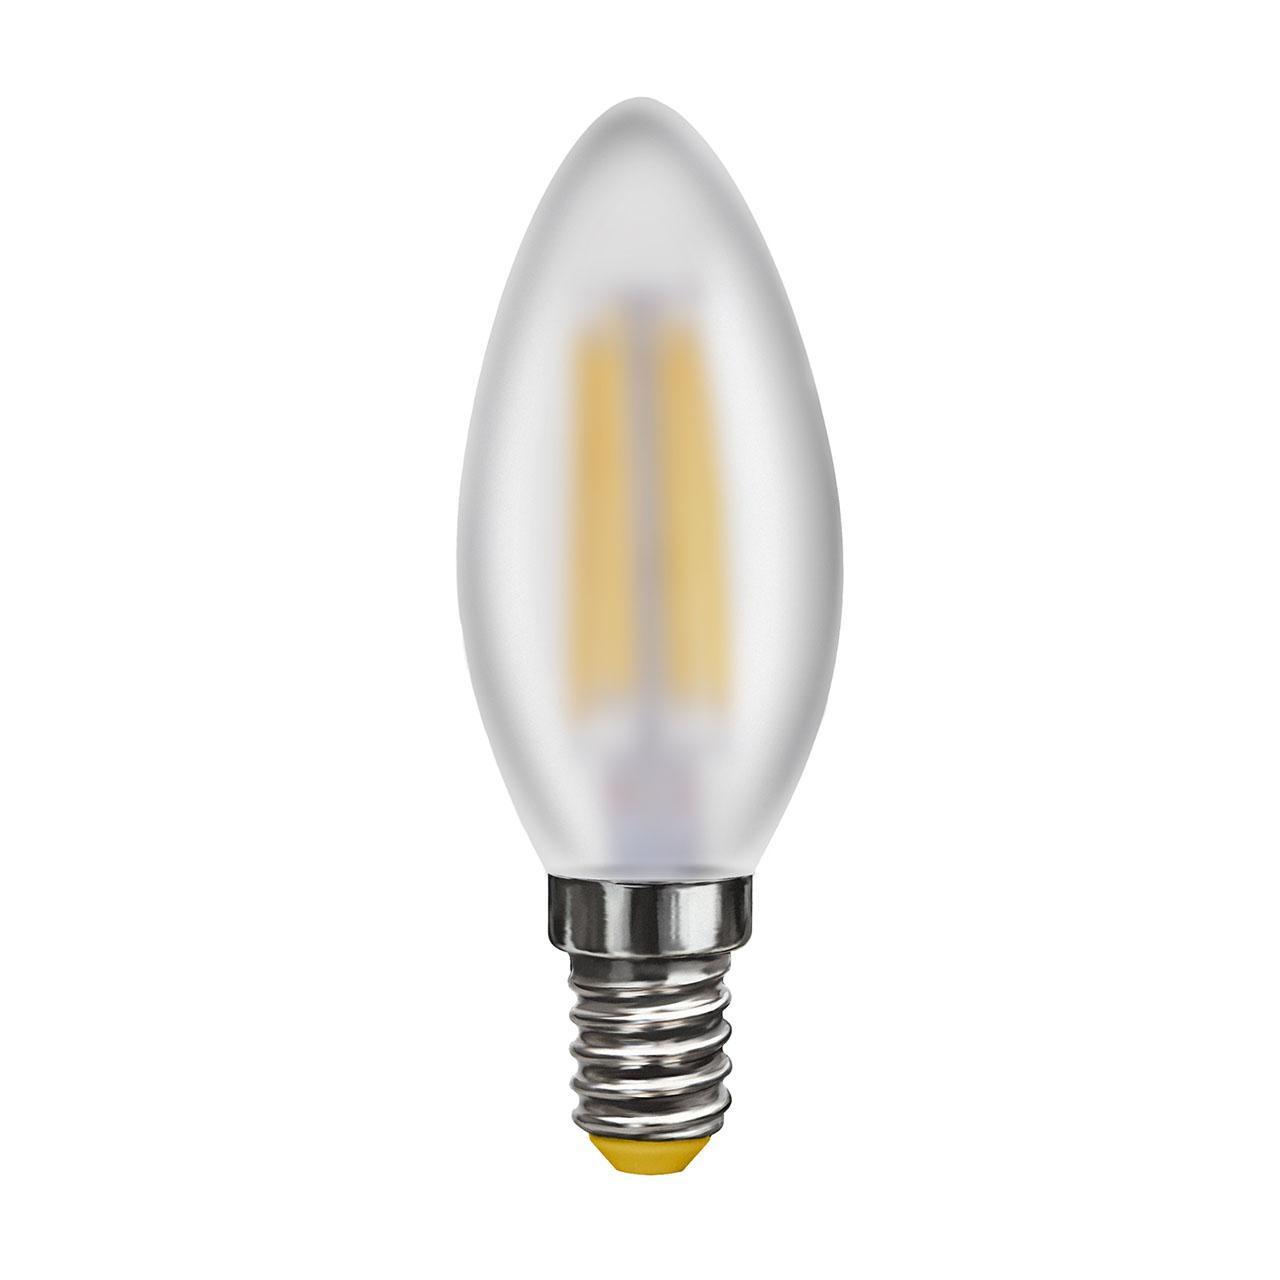 Лампа светодиодная филаментная E14 4W 2800К матовая VG10-C2E14warm4W-F 6999 цена